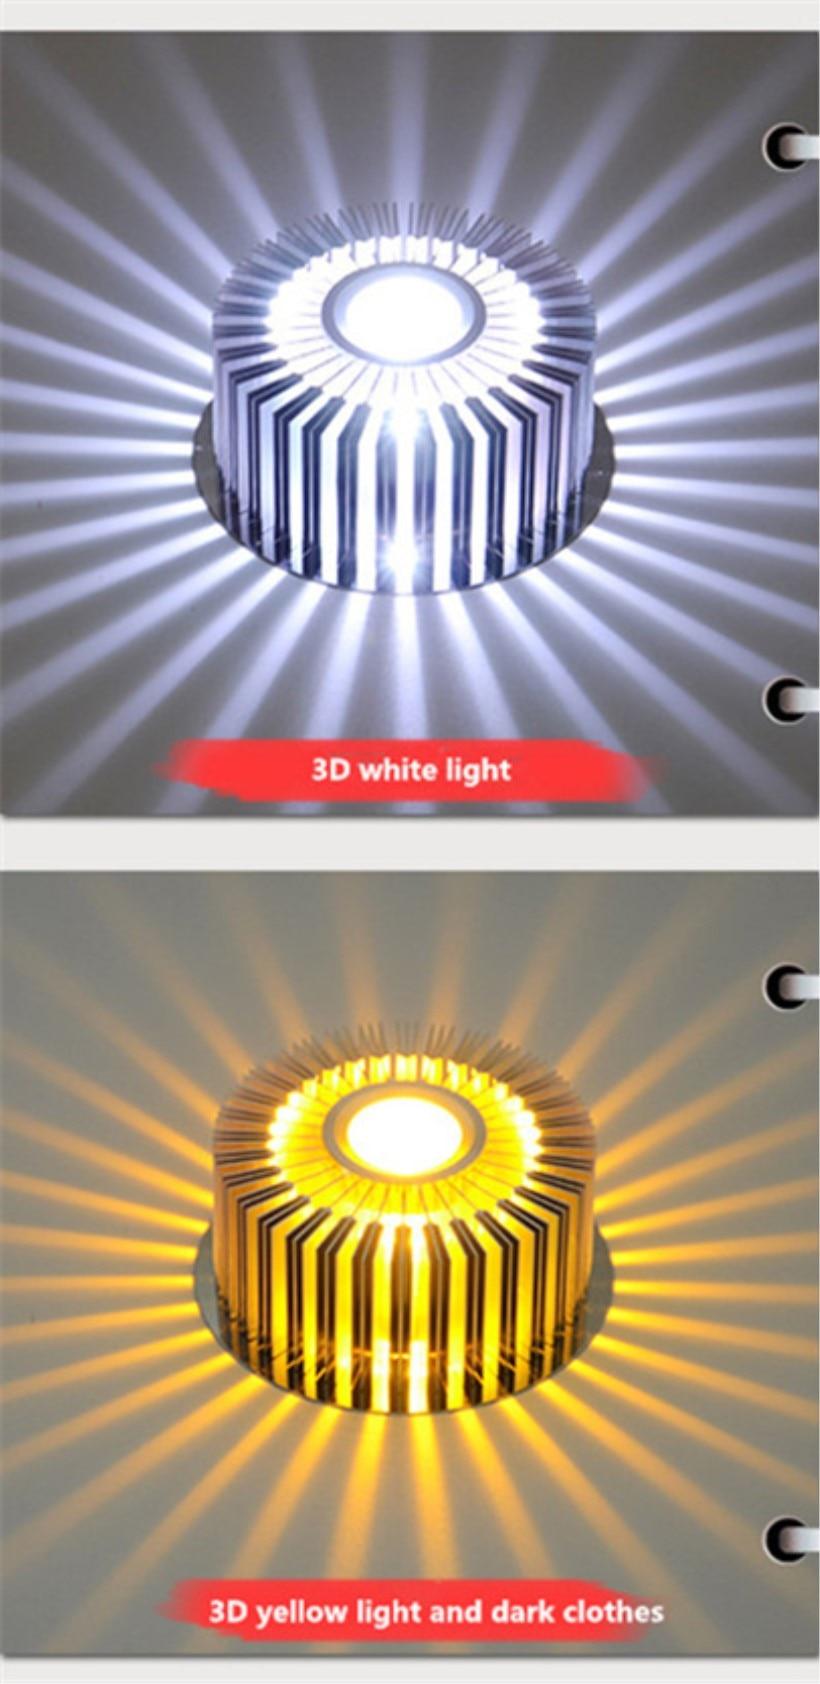 LED Crystal Aisle Celling Light (5)